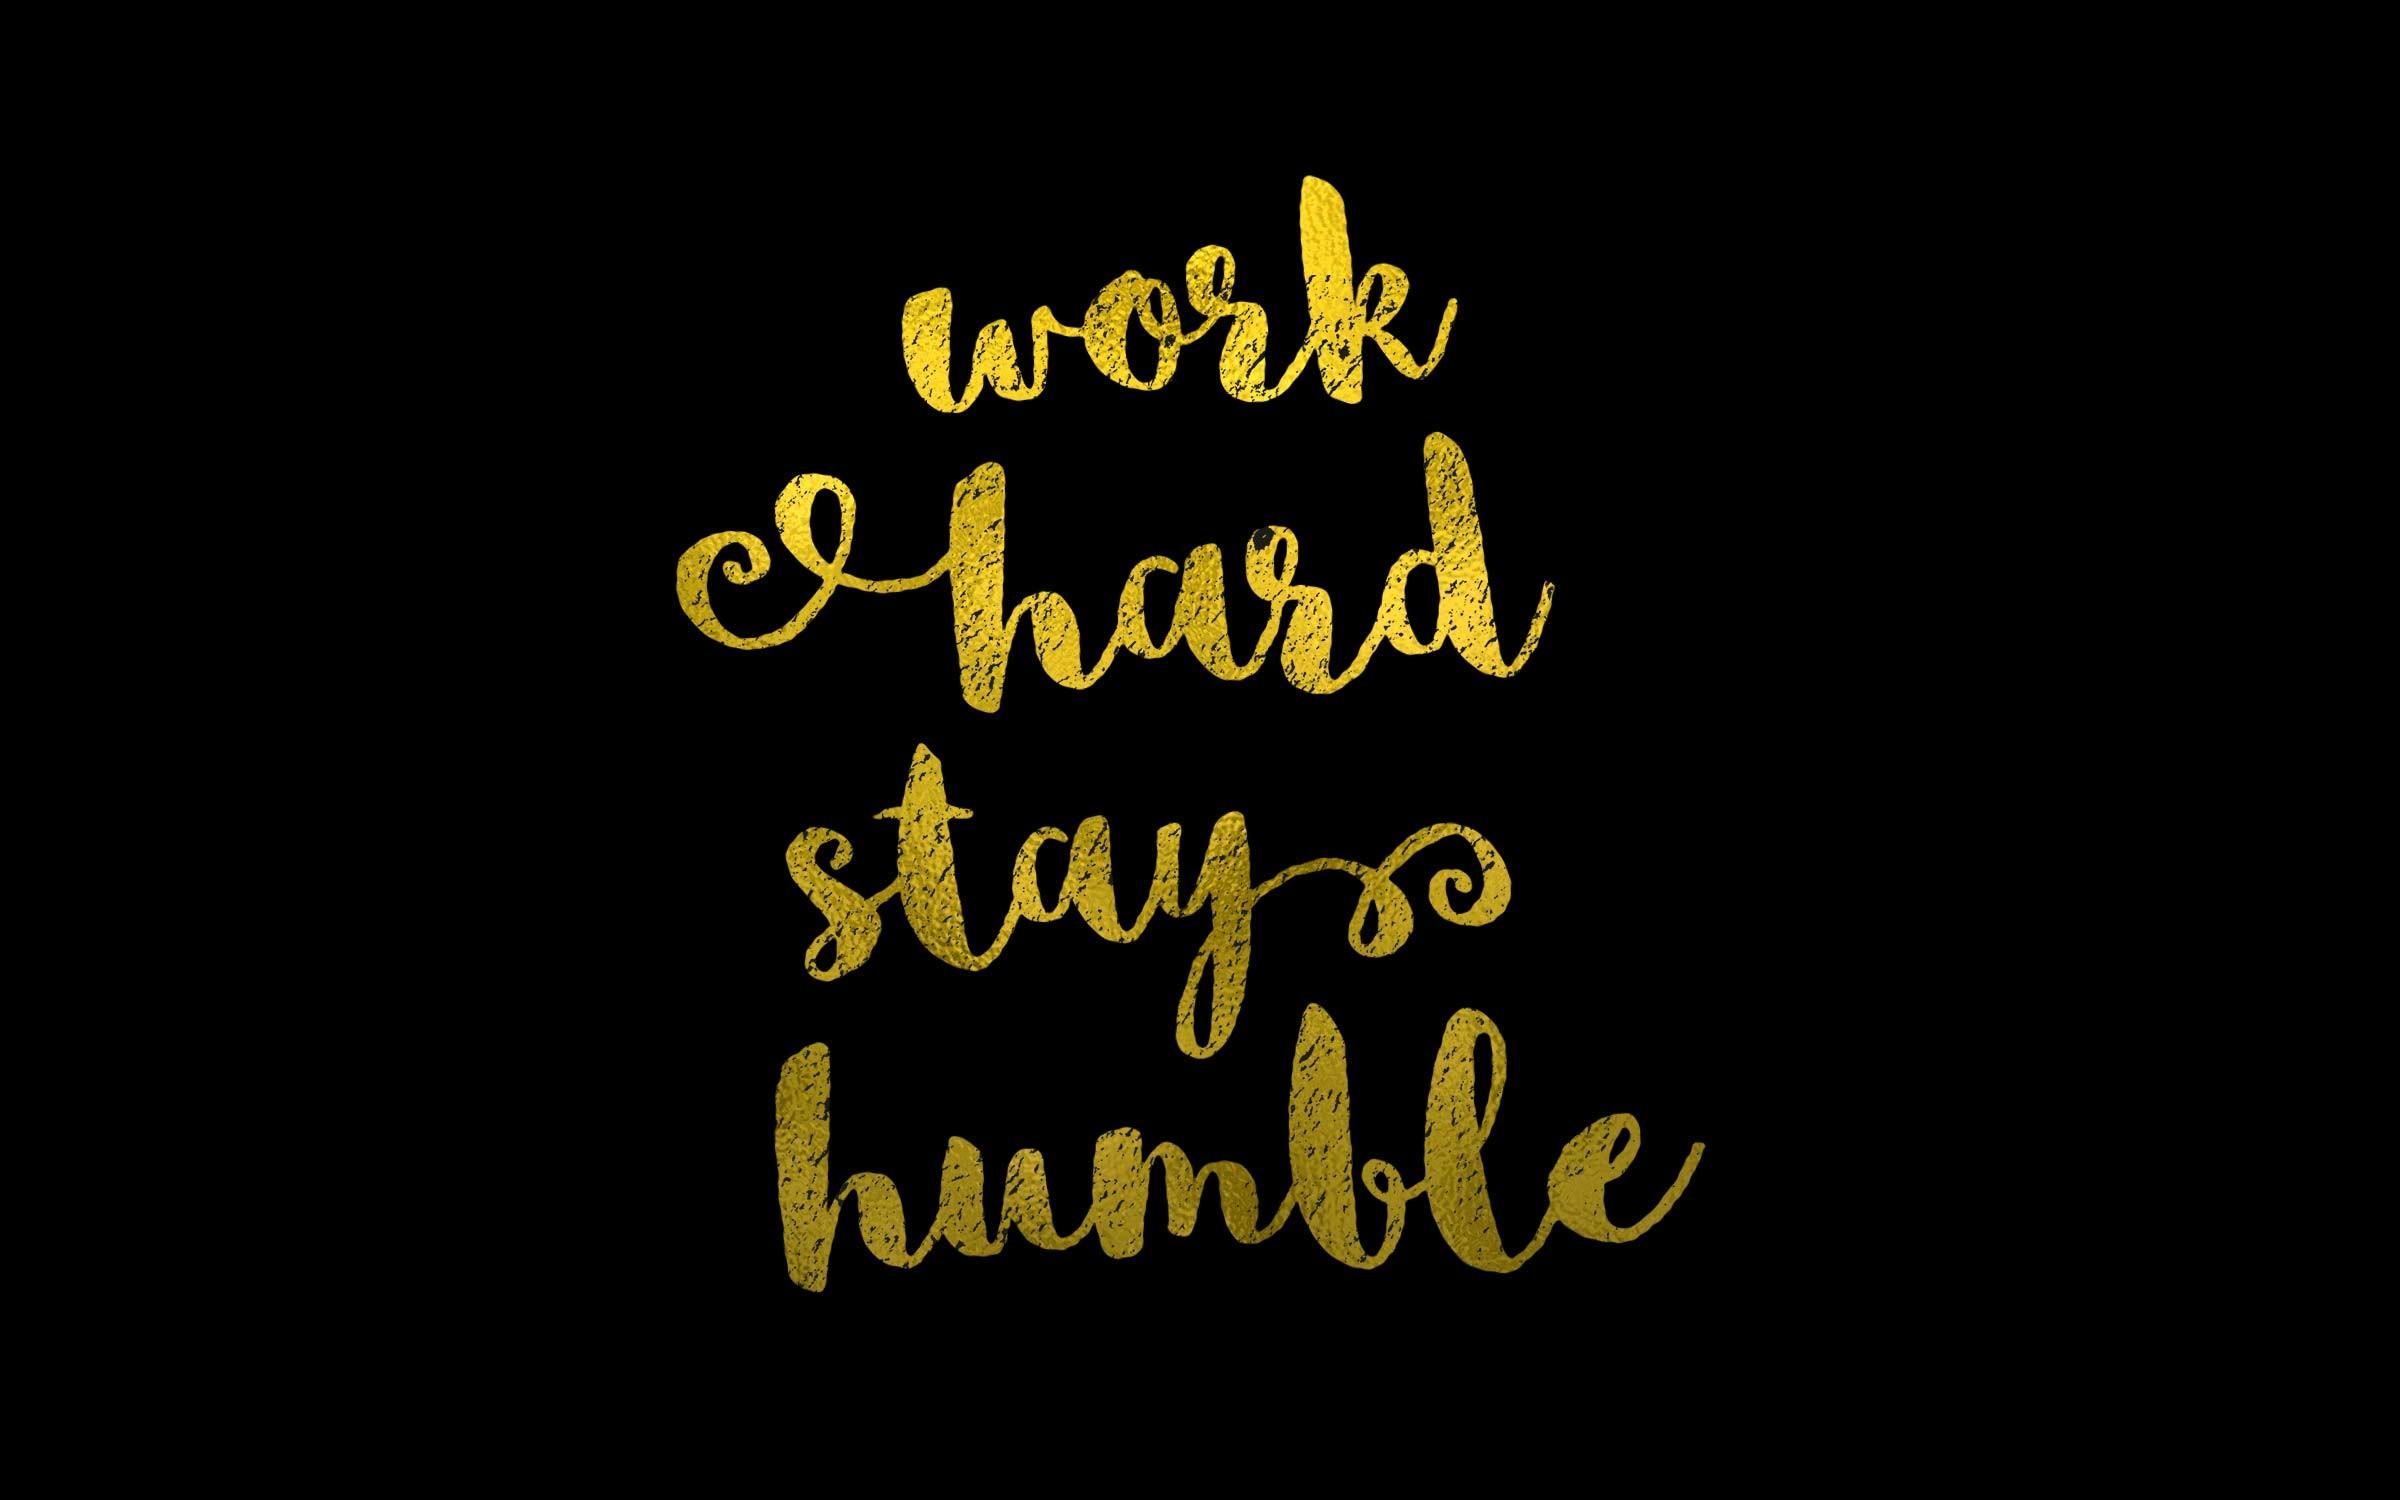 work-hard-stay-humble-desktop-black.jpg 2,400×1,500